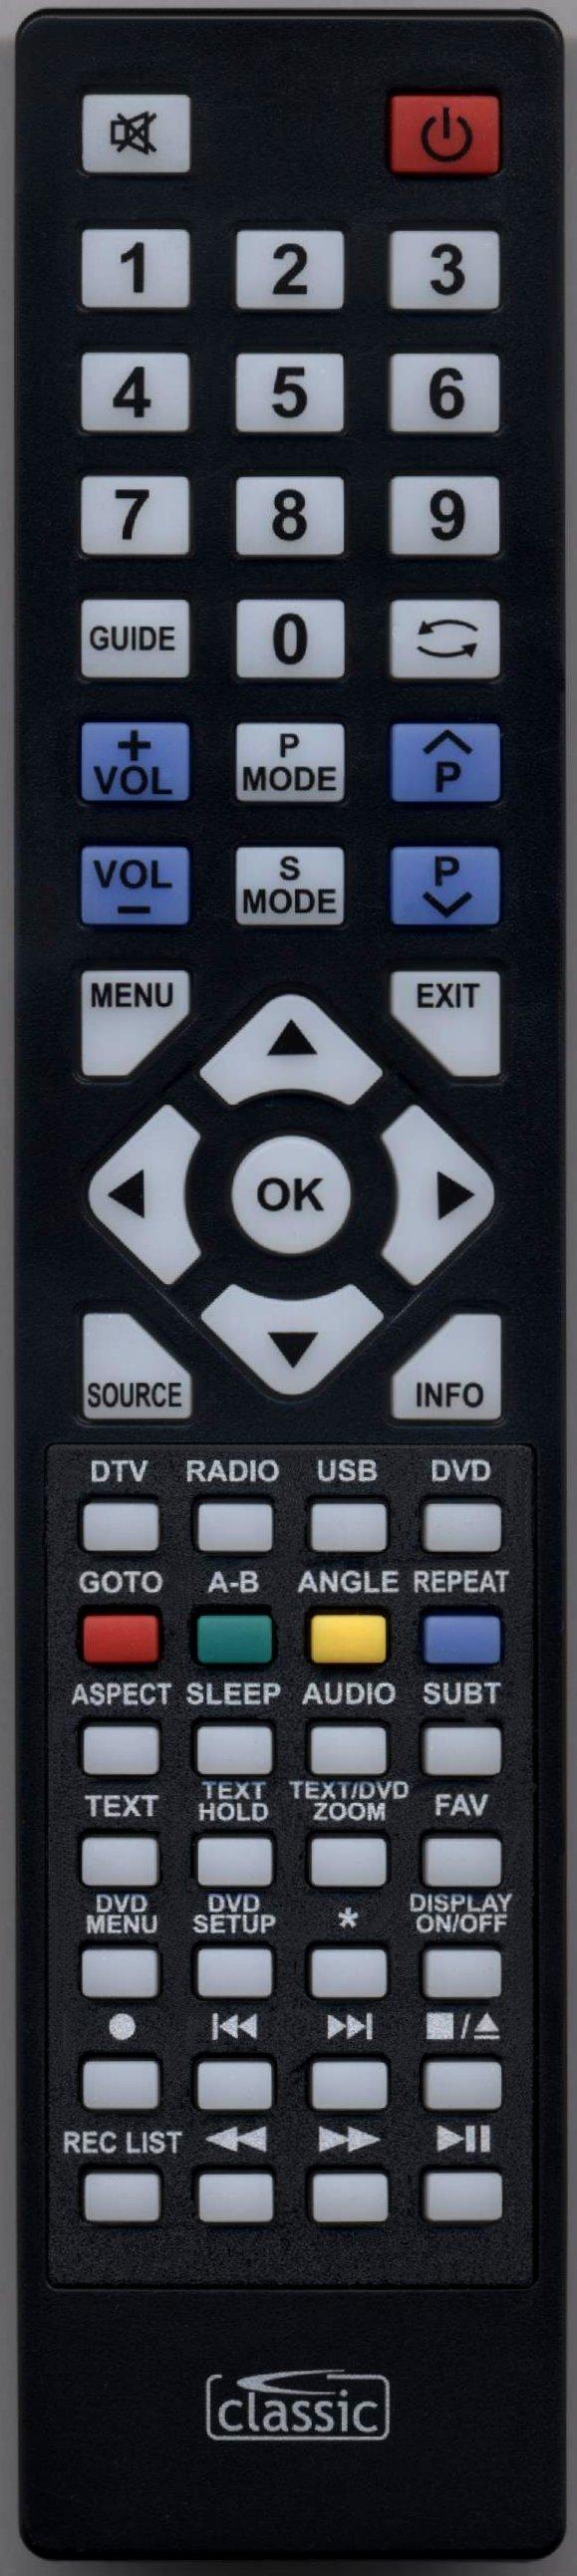 BLAUPUNKT 215-2071-GB-3B-FHKDUP-UK Remote Control Alternative